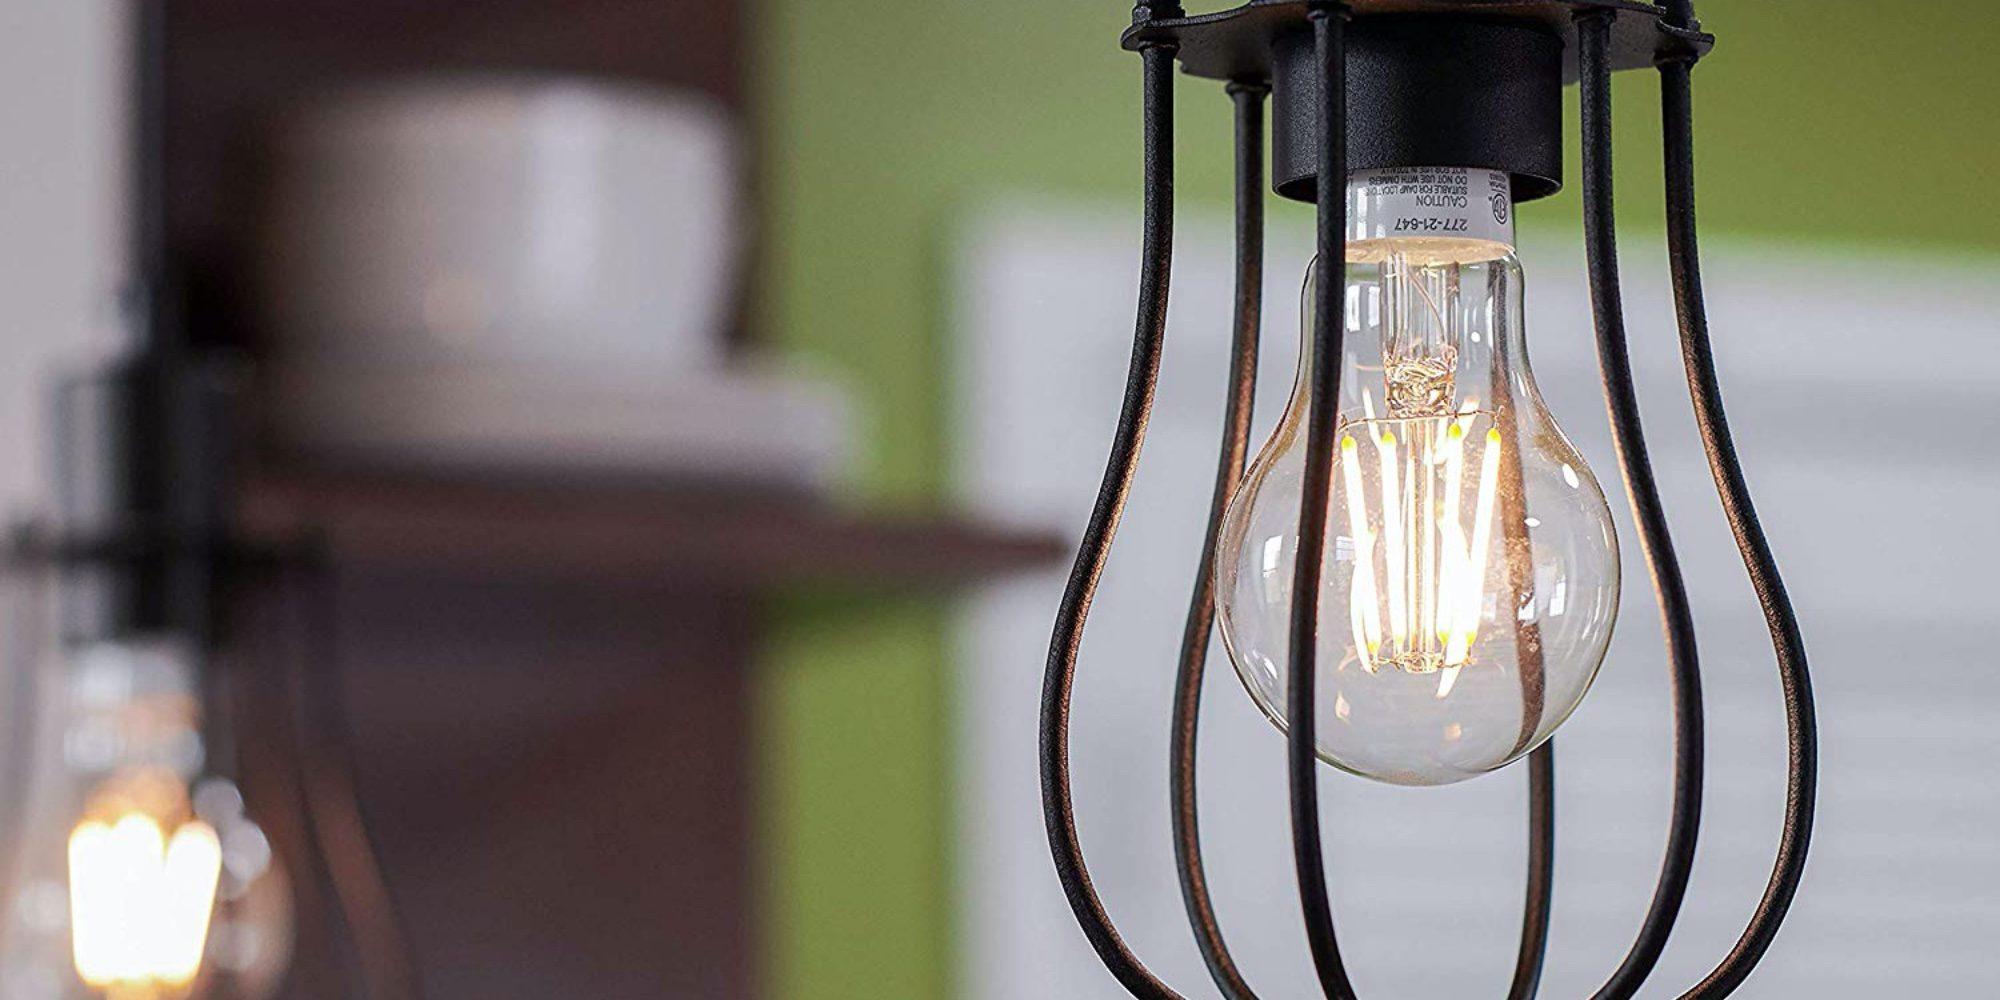 Score Sylvania's HomeKit filament light bulbs on sale from $19.50 (Save 26%)